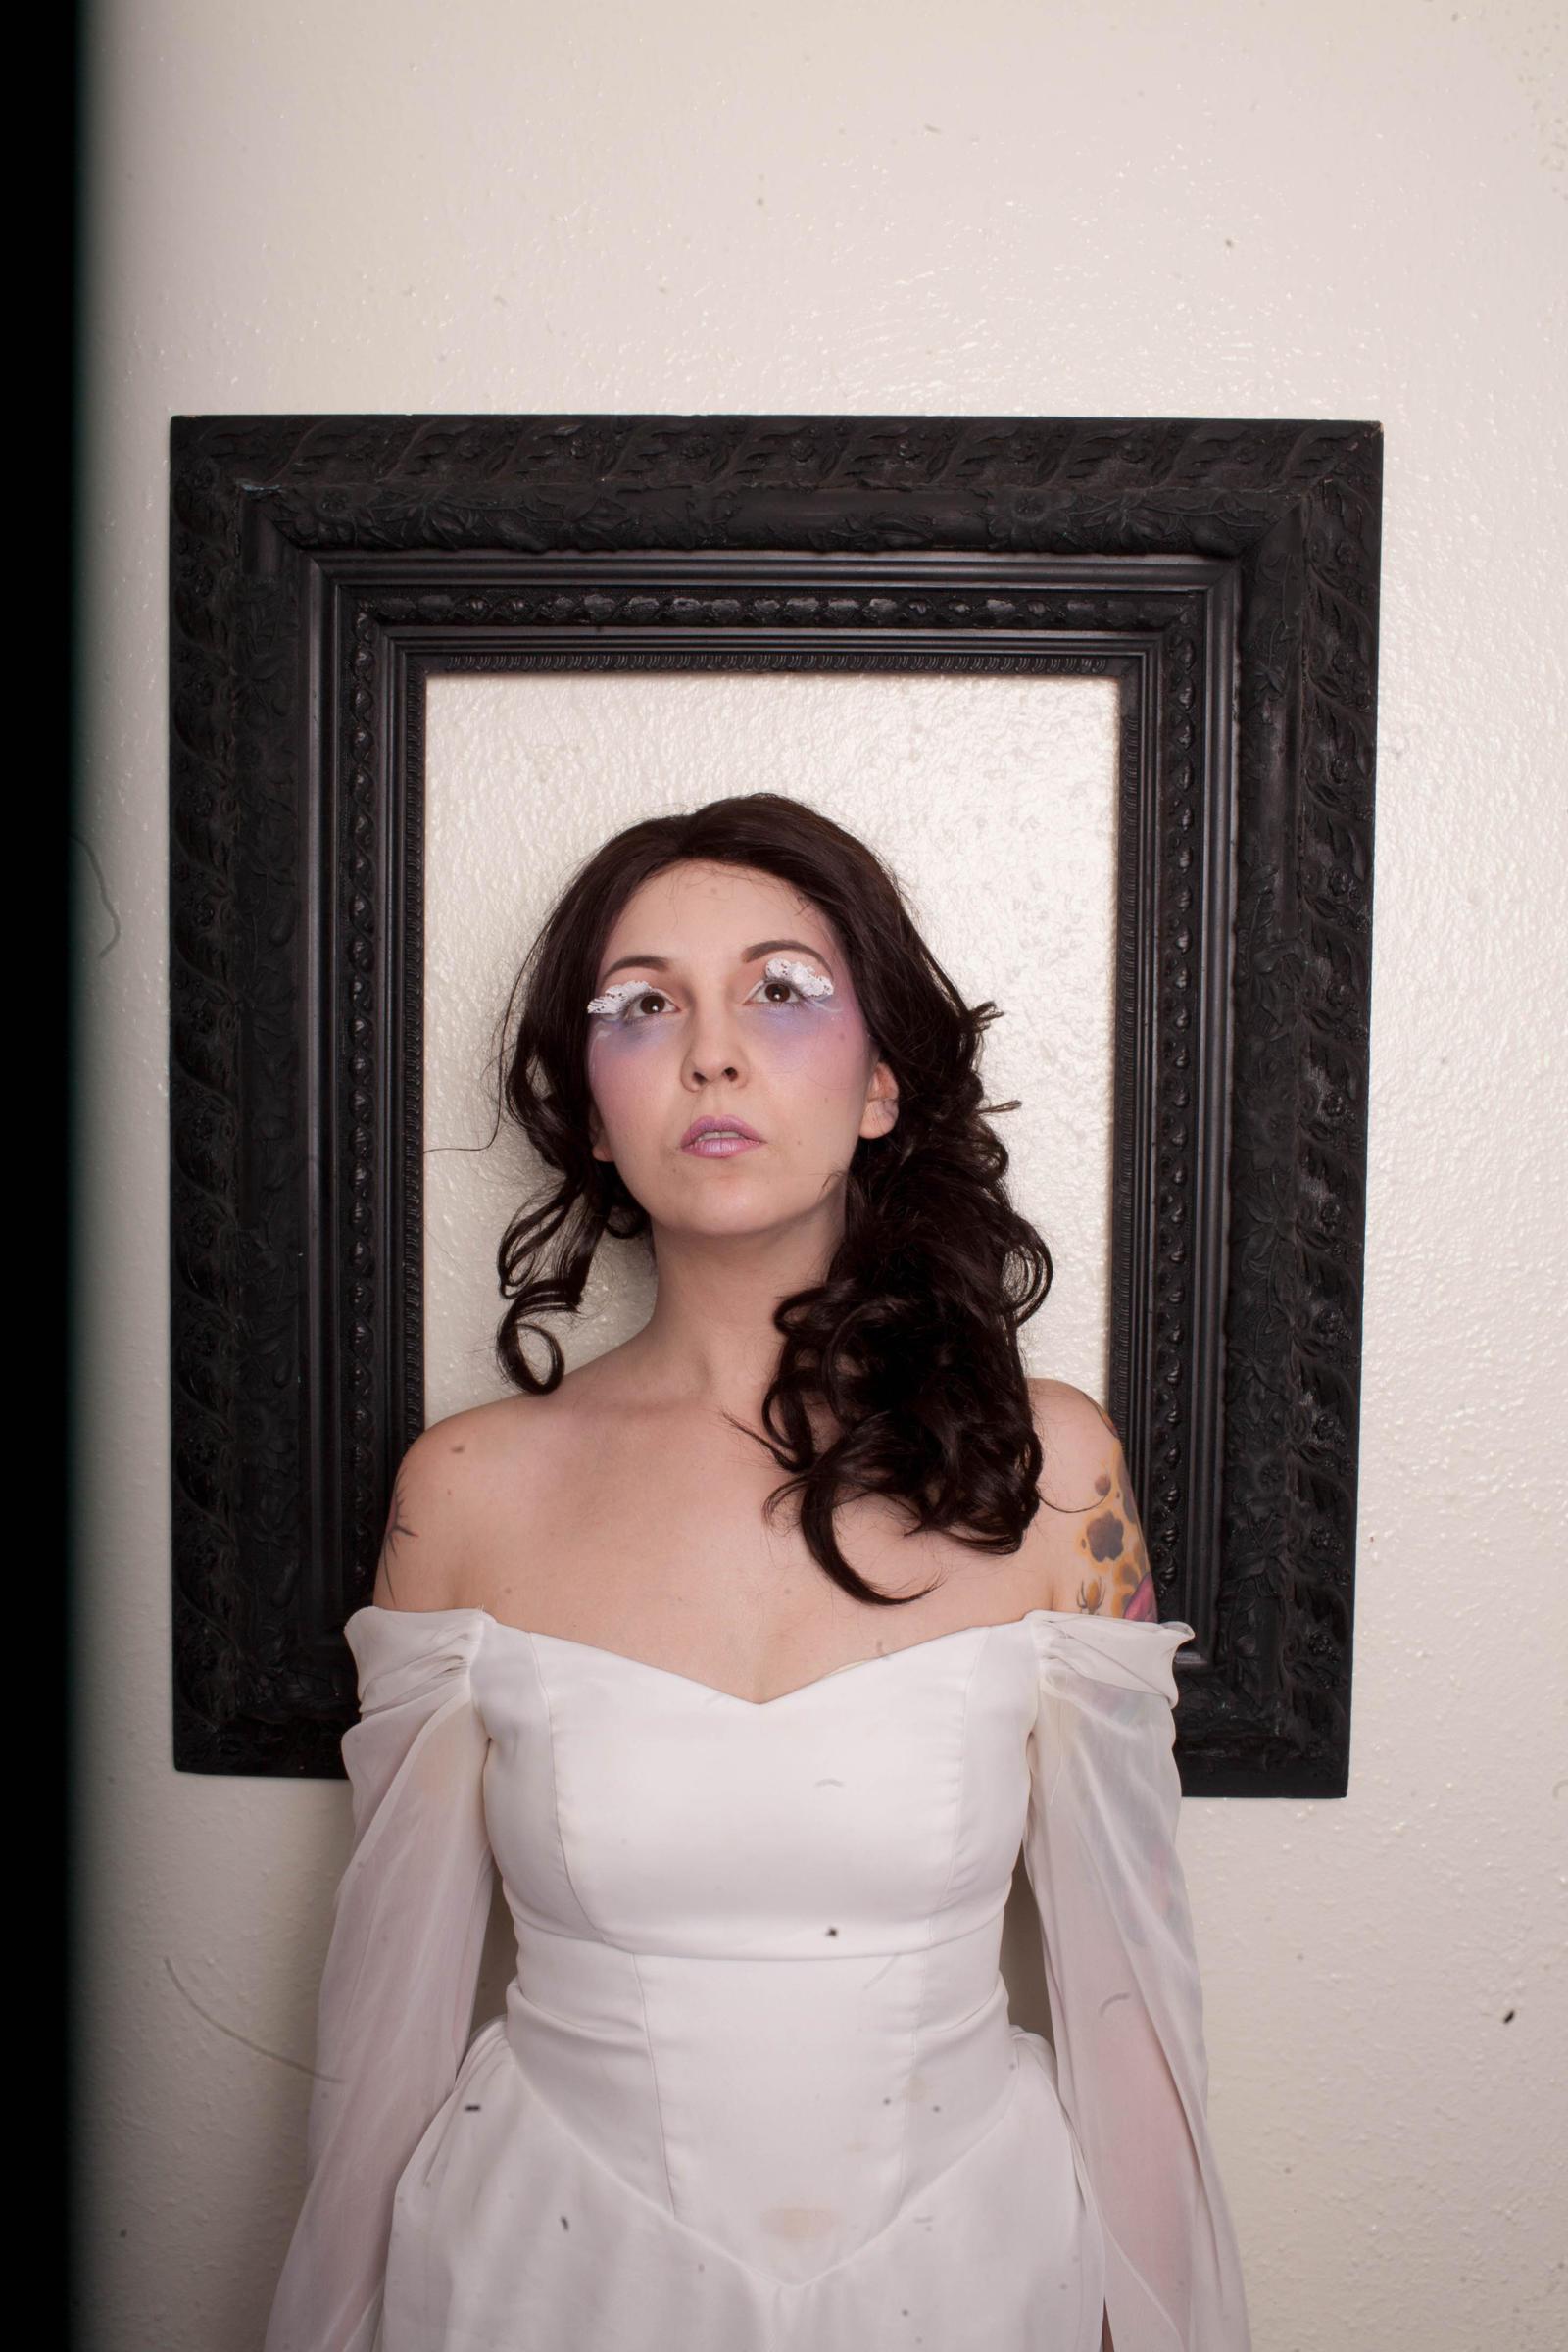 frame by VioletBreezeStock